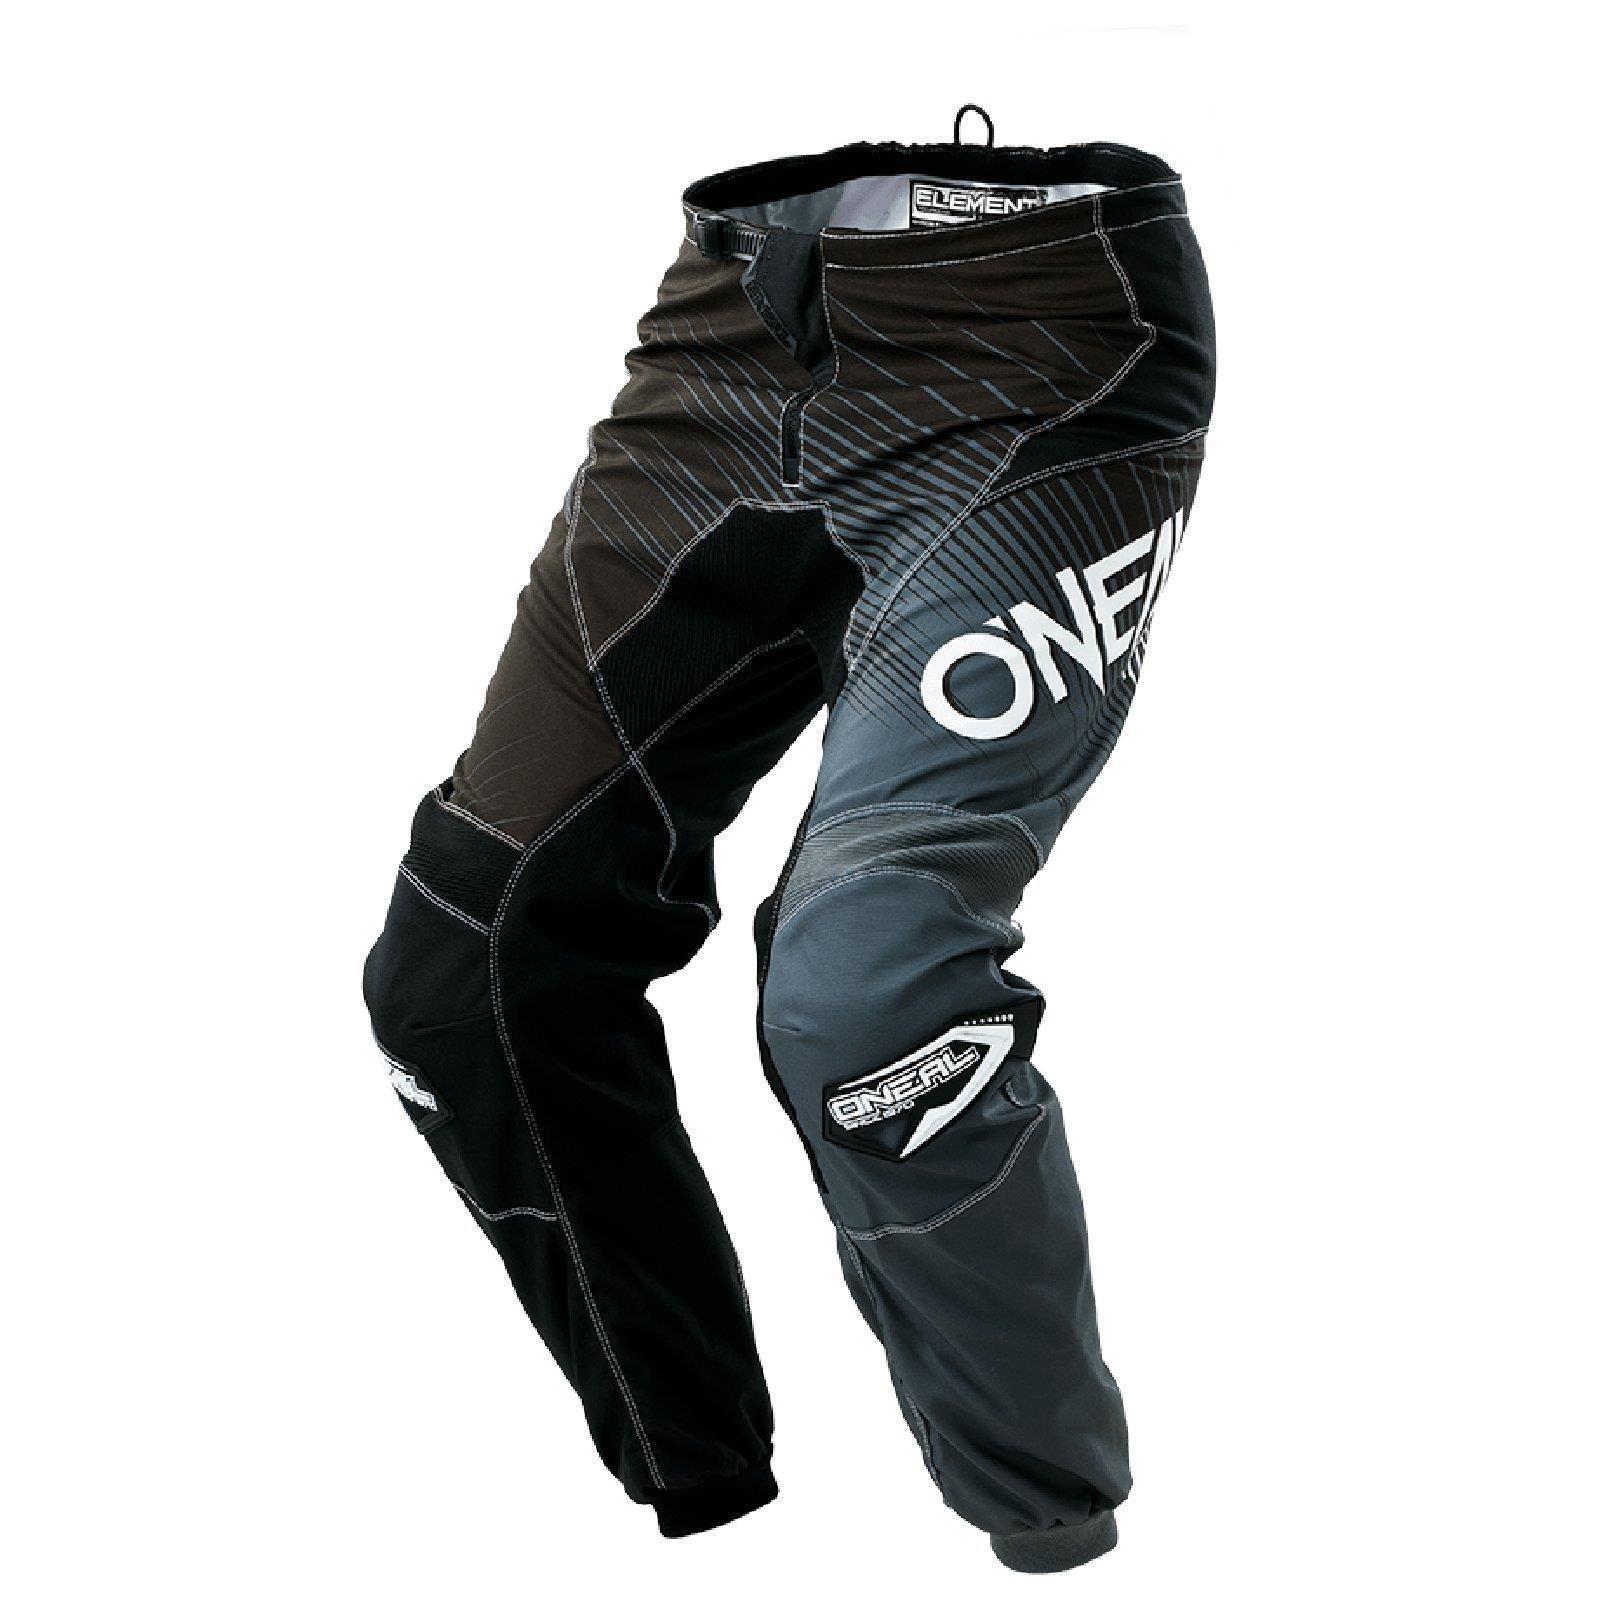 Elemento-oNeal-racewear-Jersey-pantalones-a-ninos-adulto-Motocross-Enduro-downhill miniatura 10